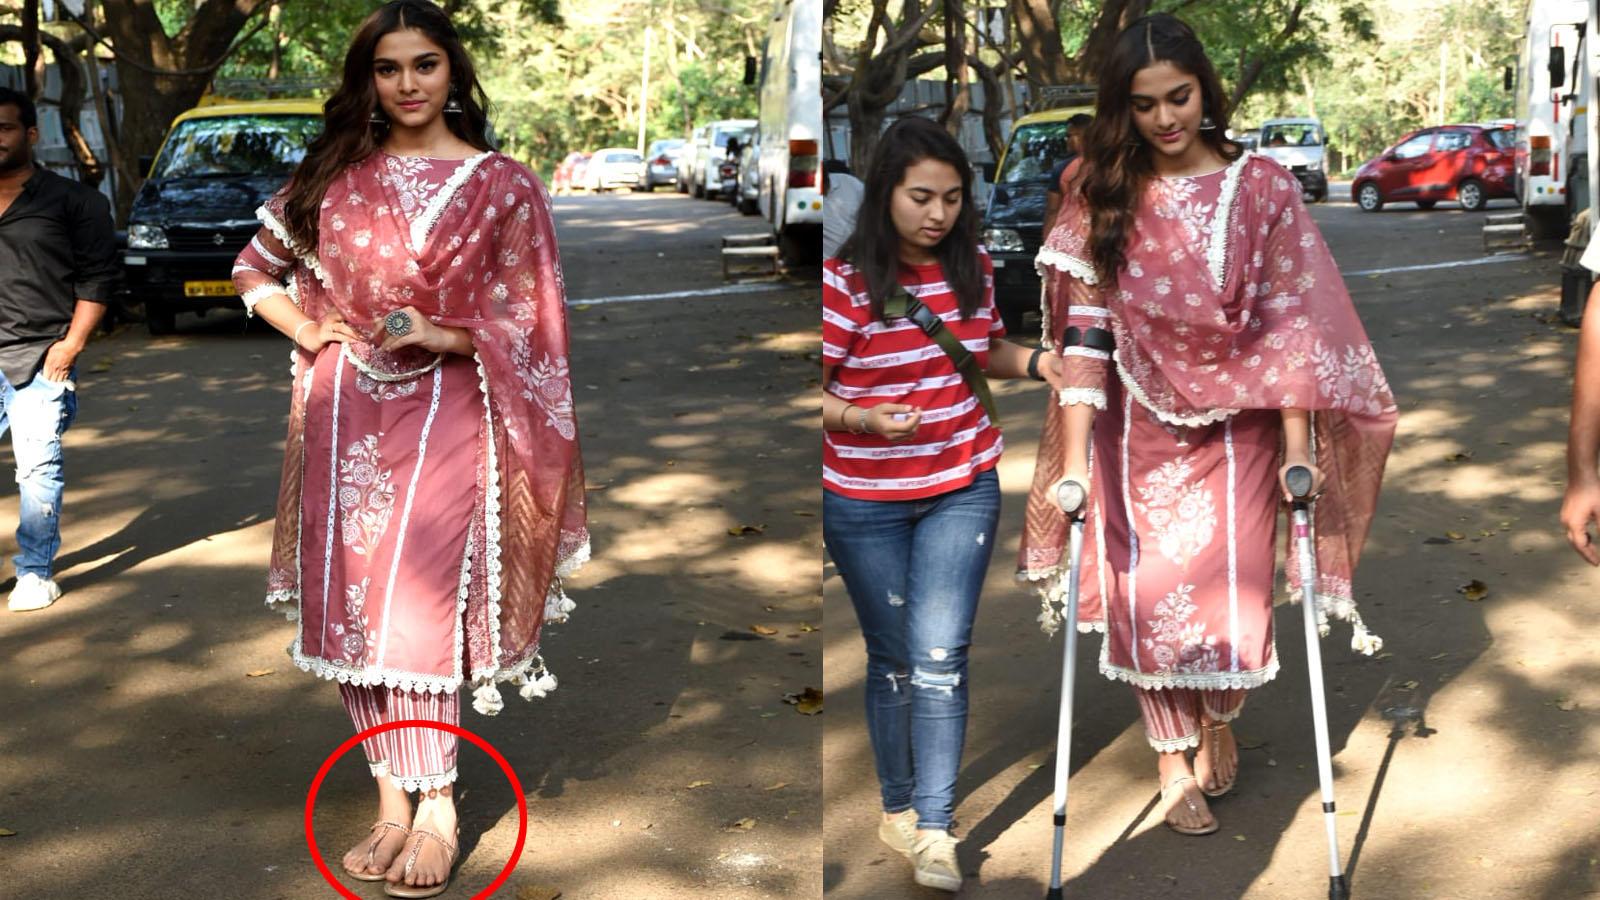 dabangg-3-promotions-injured-saiee-manjrekar-papped-with-crutches